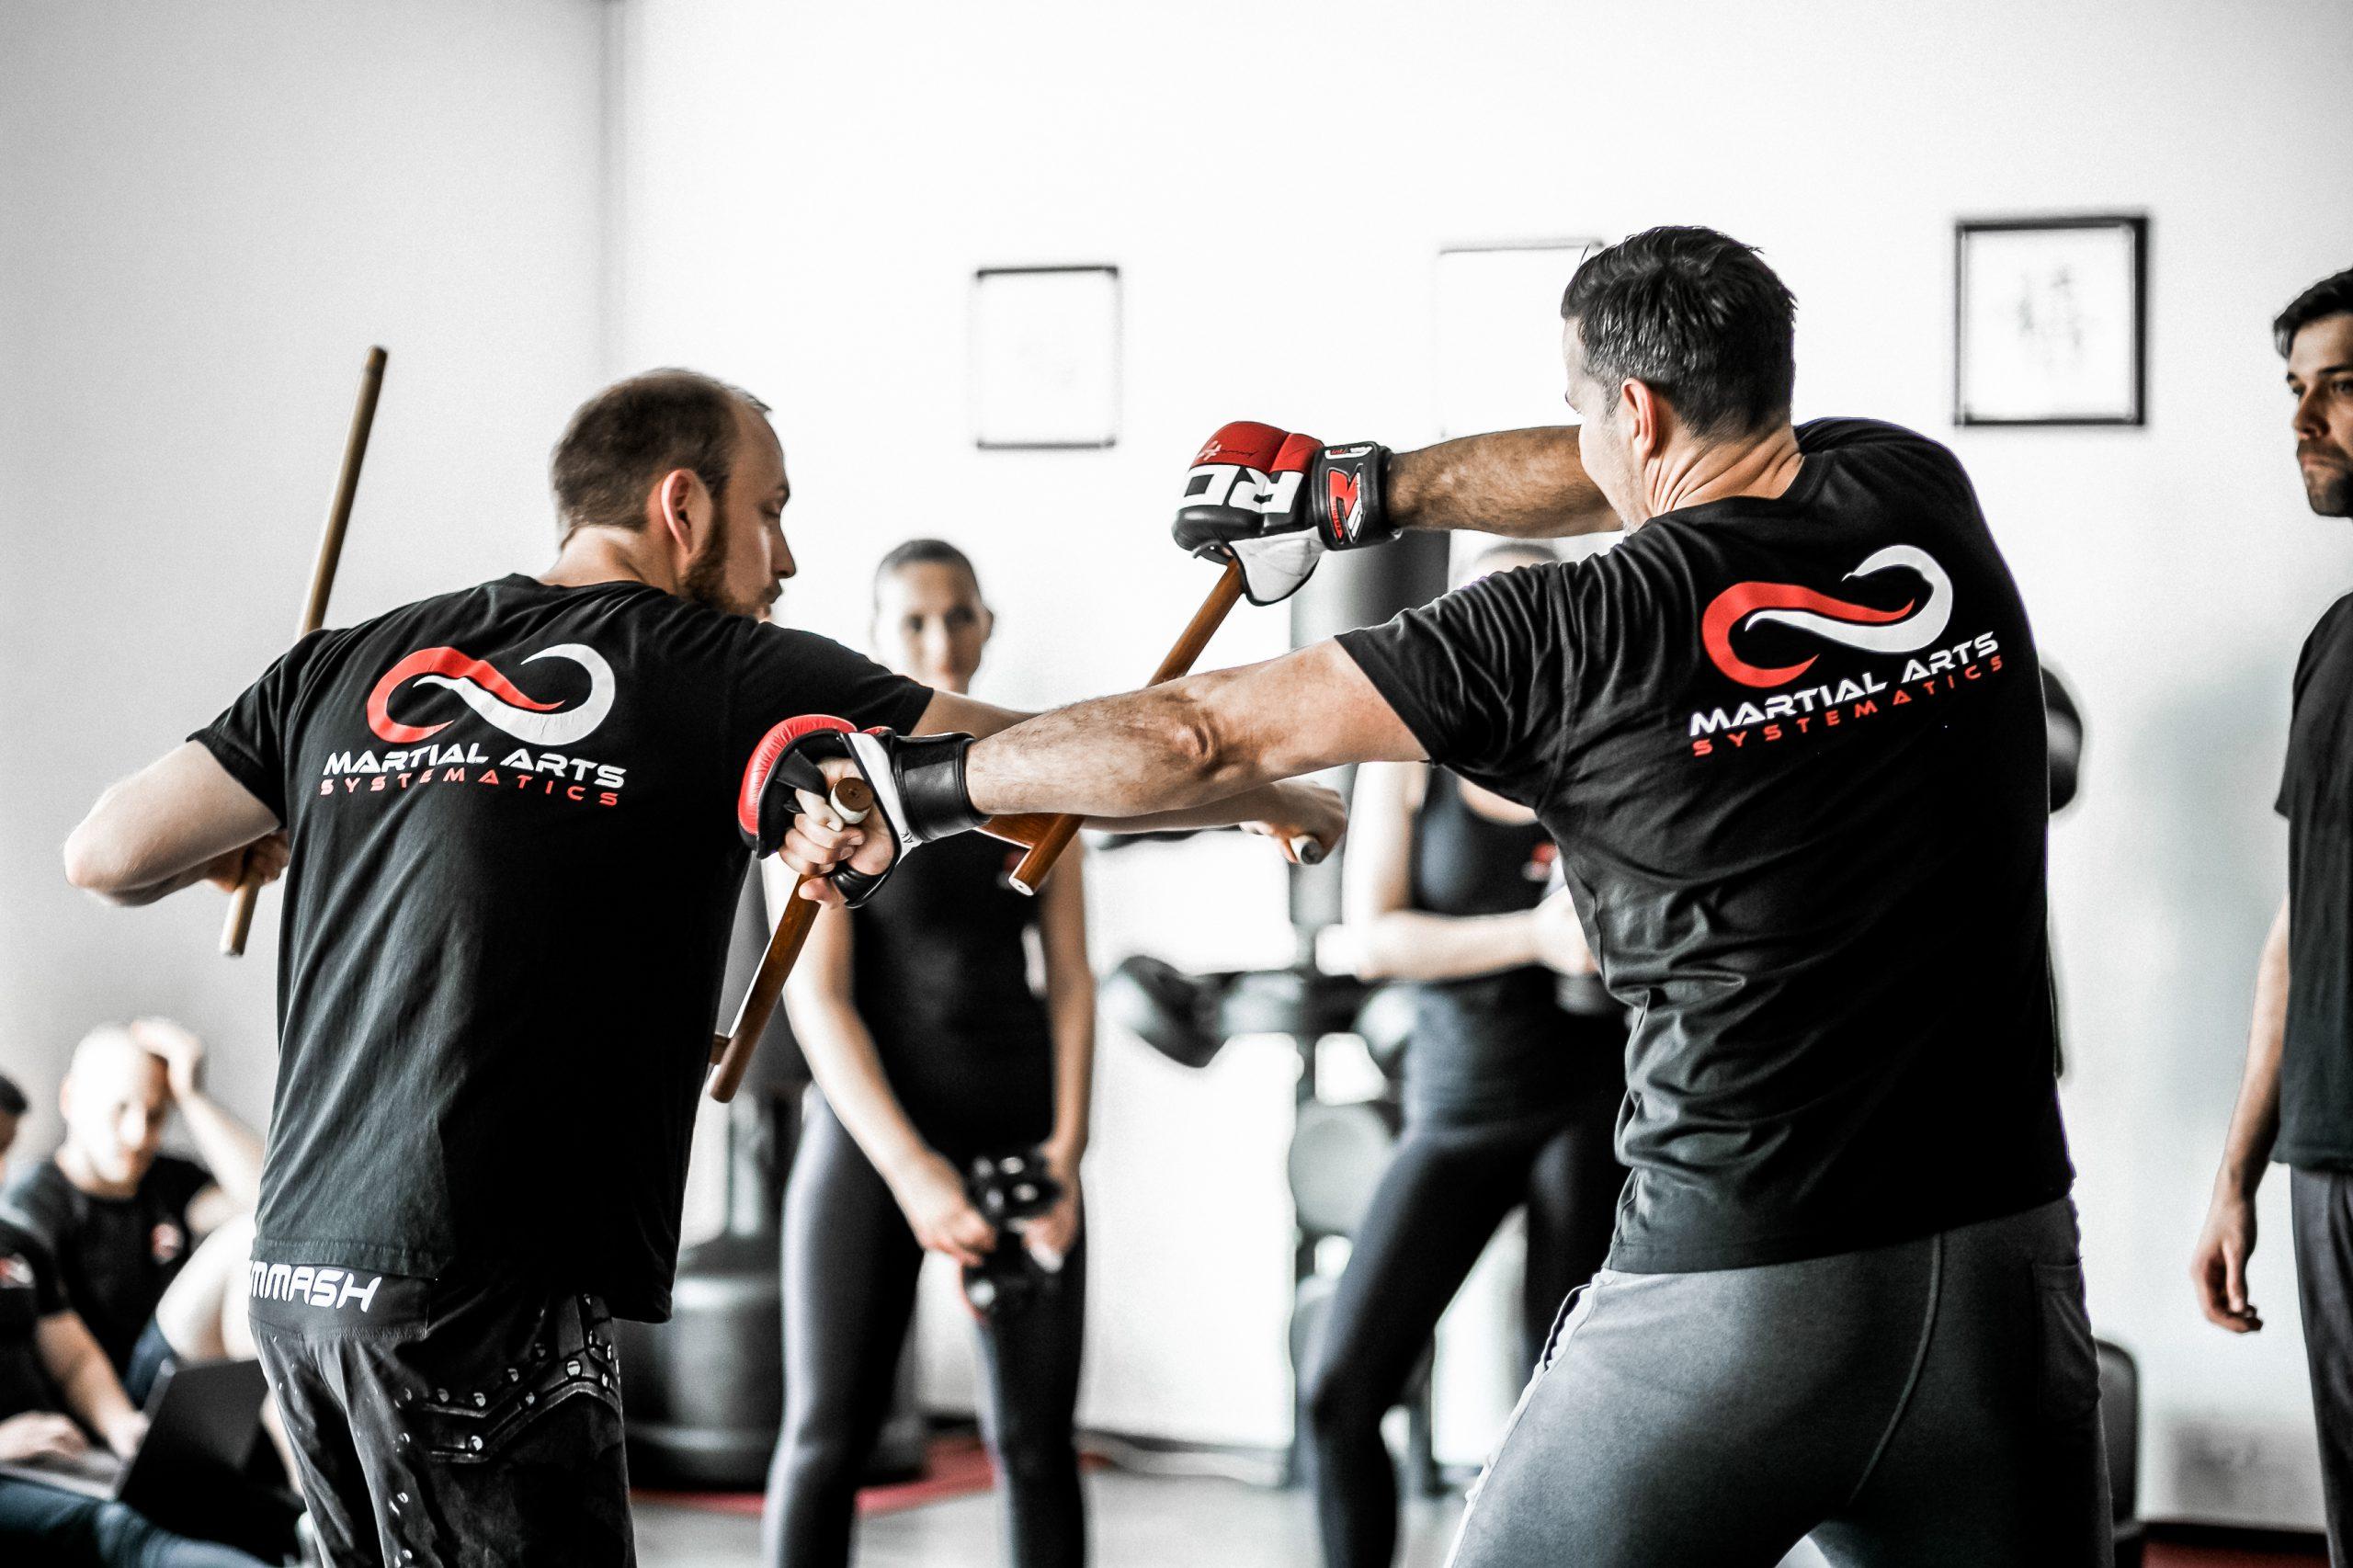 Kampfkunst Waffentraining